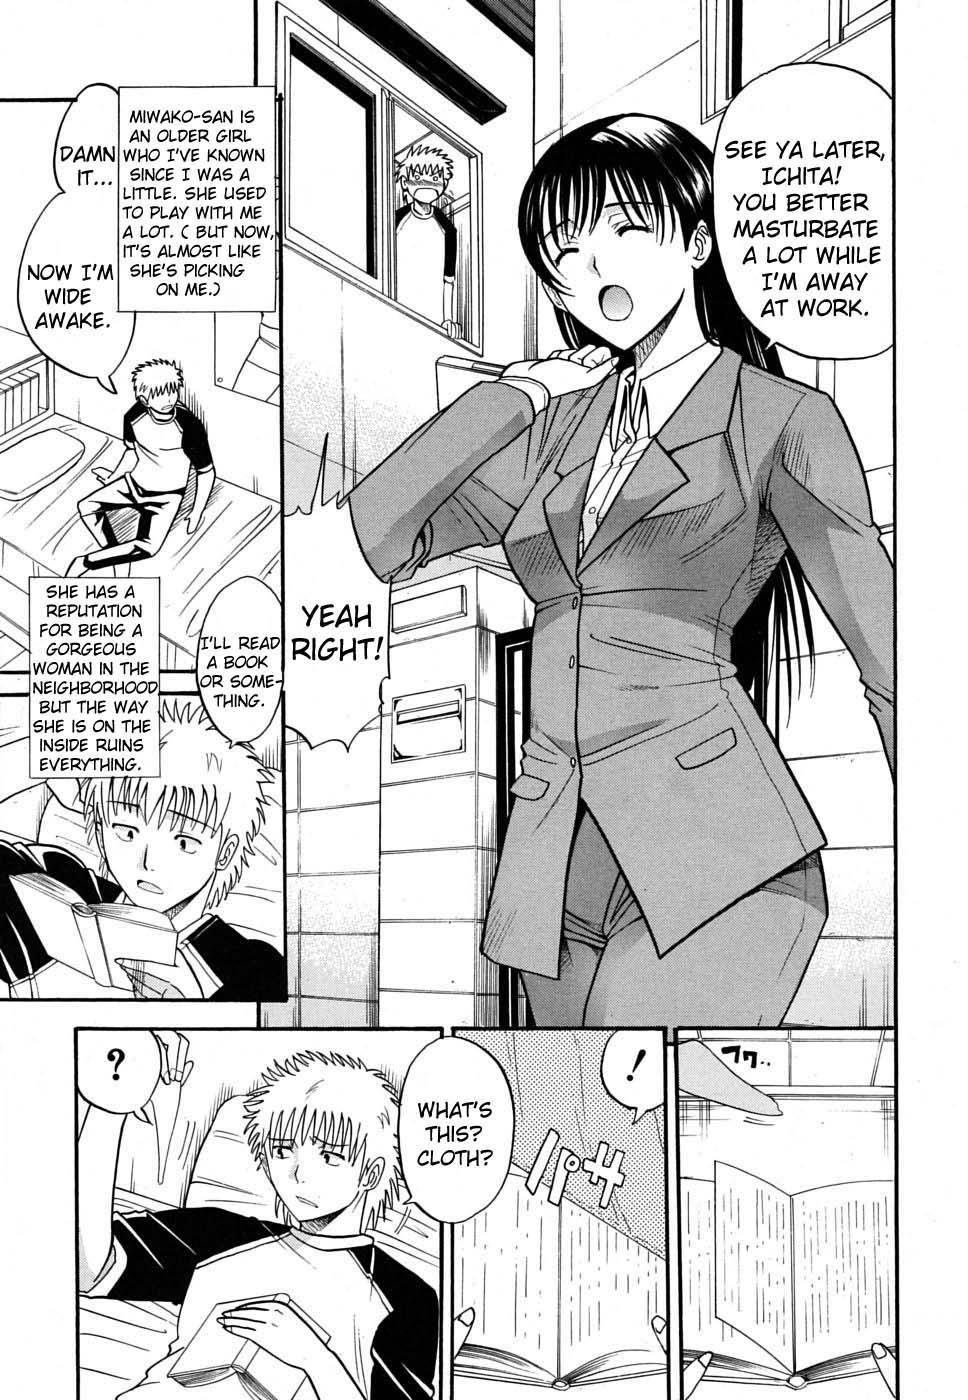 Otonari-san to no Shojijou | Secret Fling with the Neighbor 2